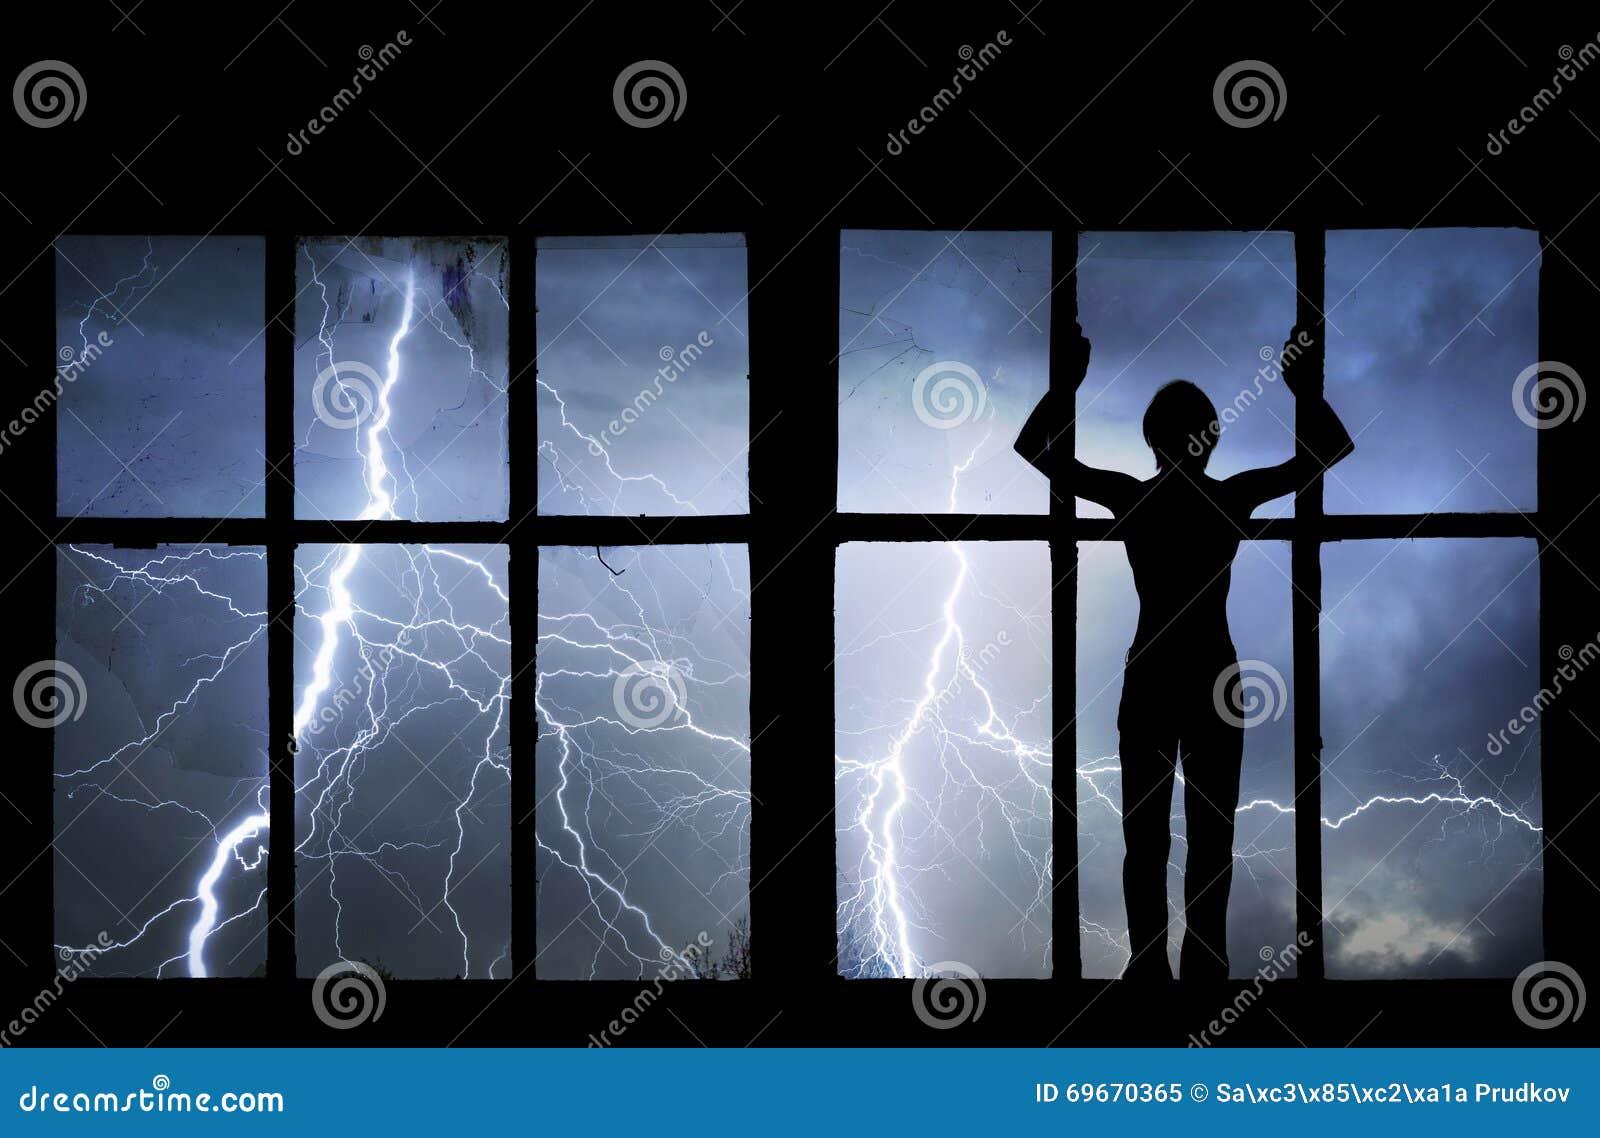 Silhouette of man watching lightning, thunder, rain and storm